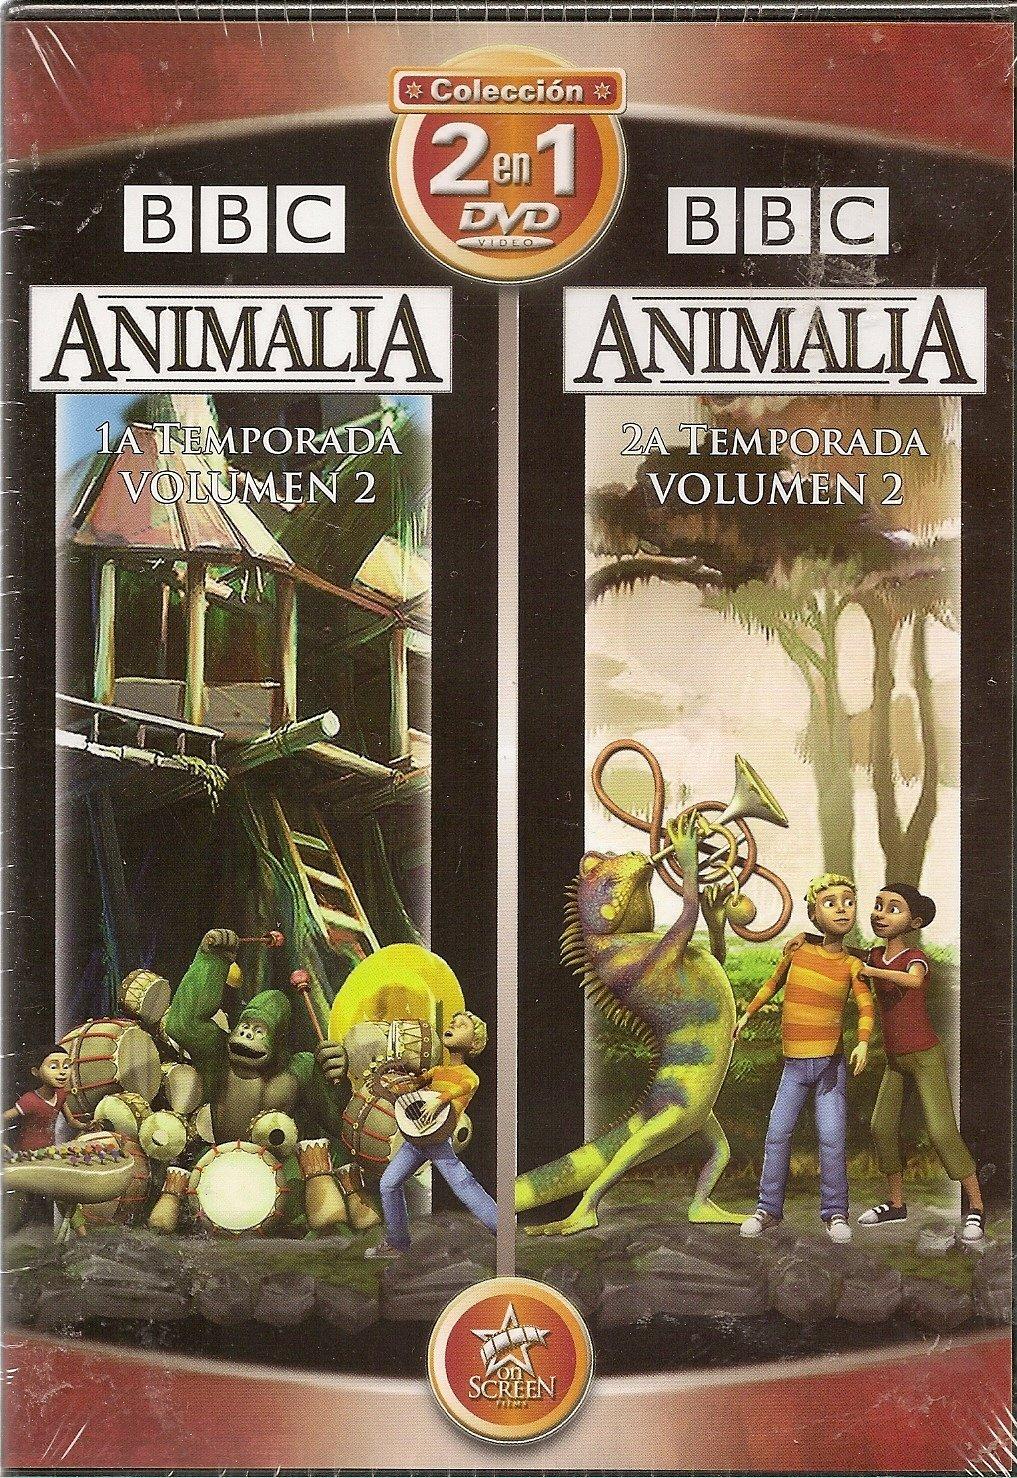 Amazon.com: Set 2 in 1 DVD Collection - Animalia: 1a ...